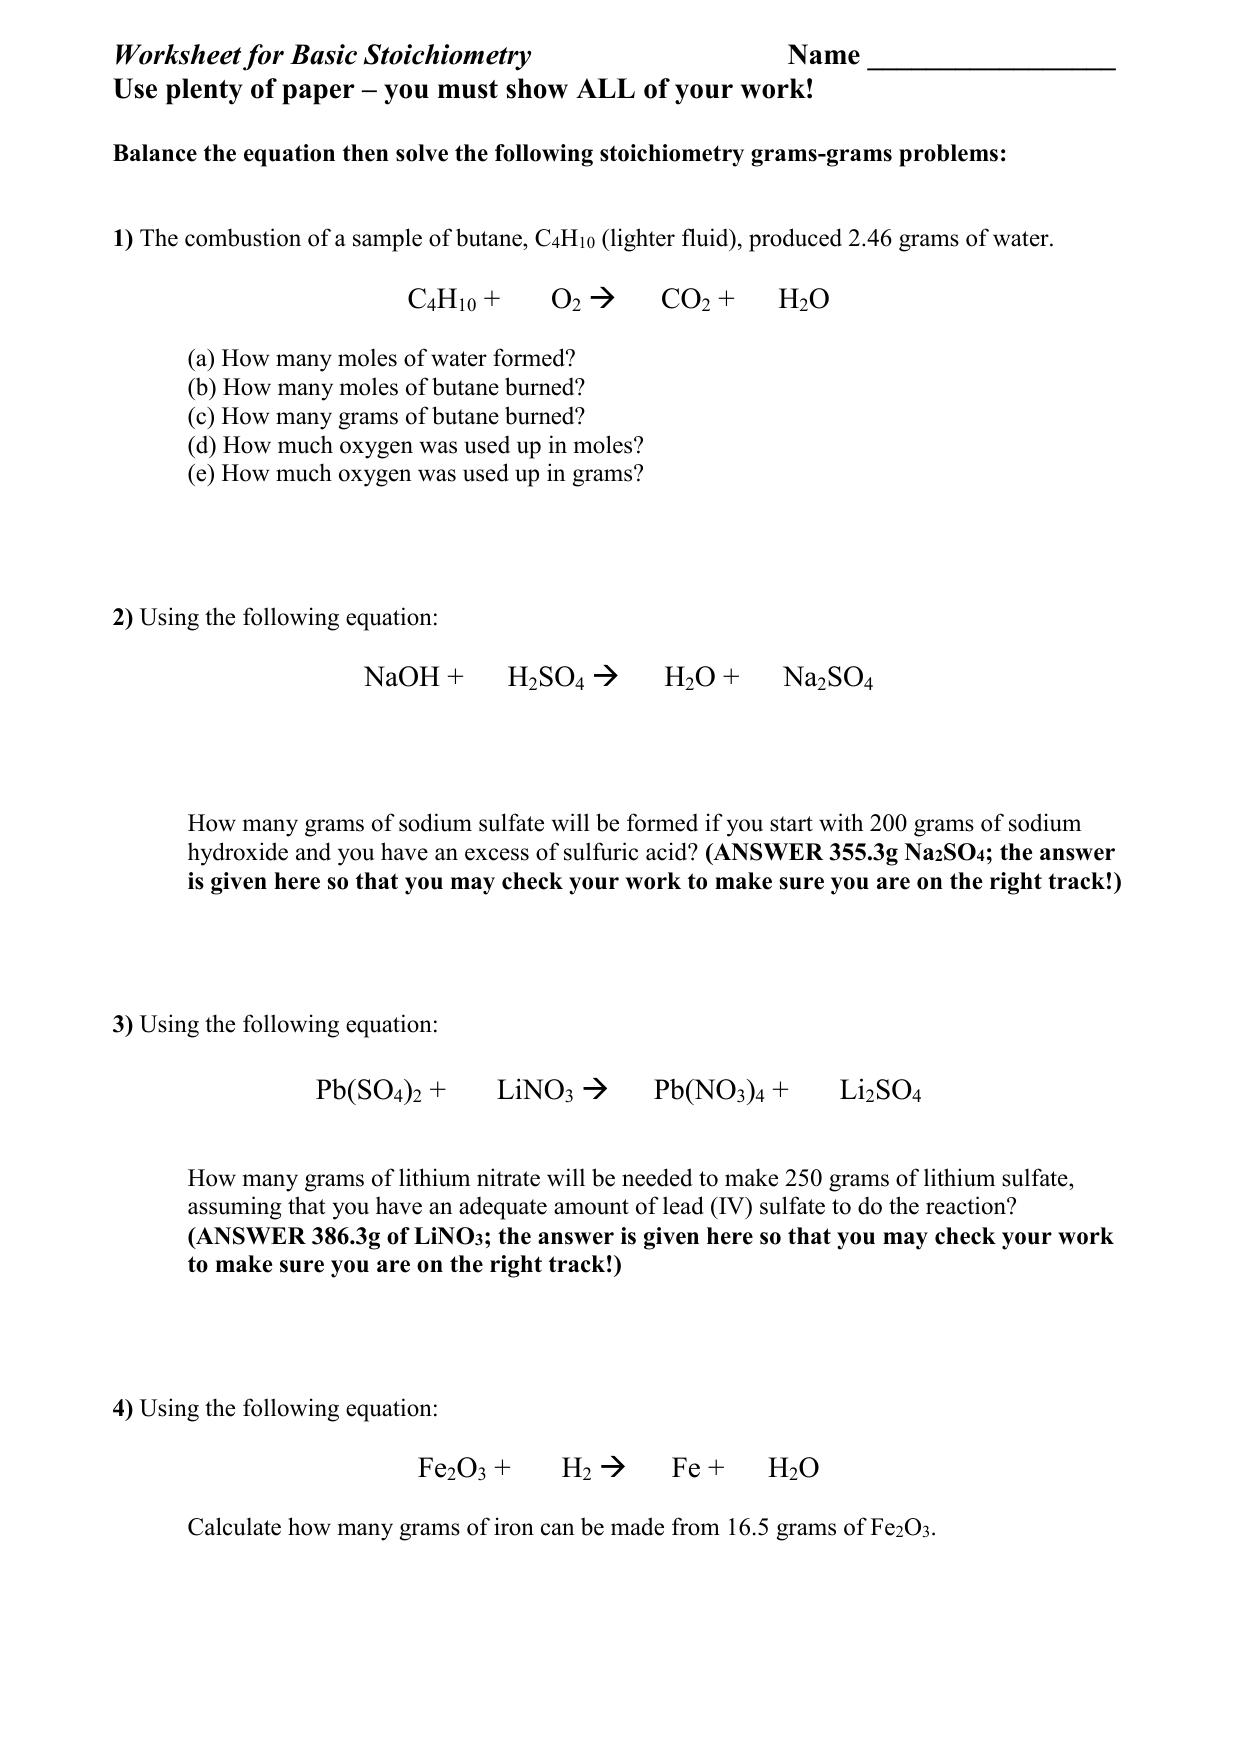 Worksheets Basic Stoichiometry Worksheet worksheet for basic stoichiometry